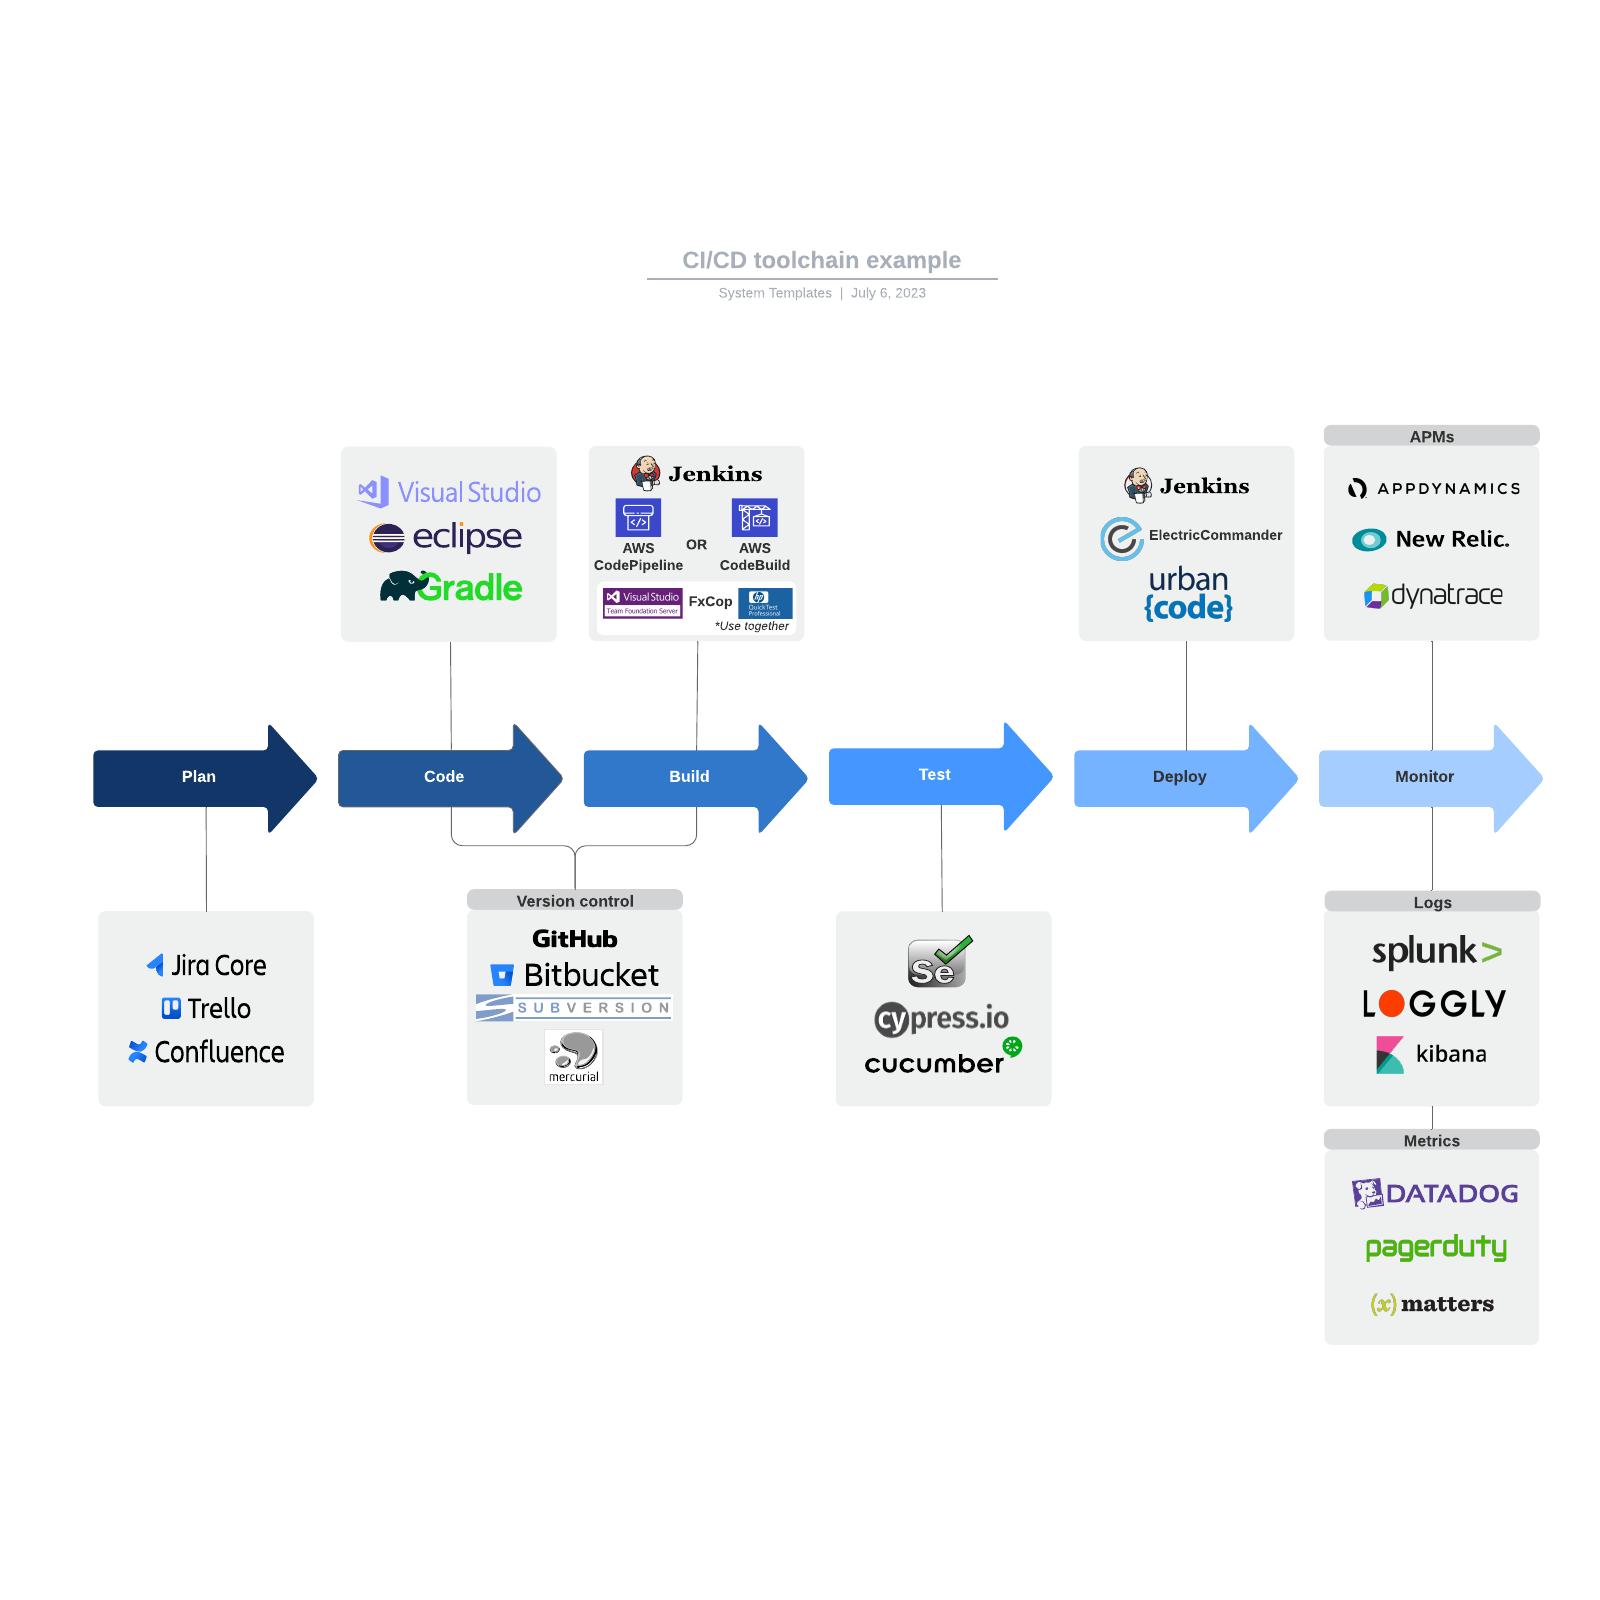 CI/CD toolchain example